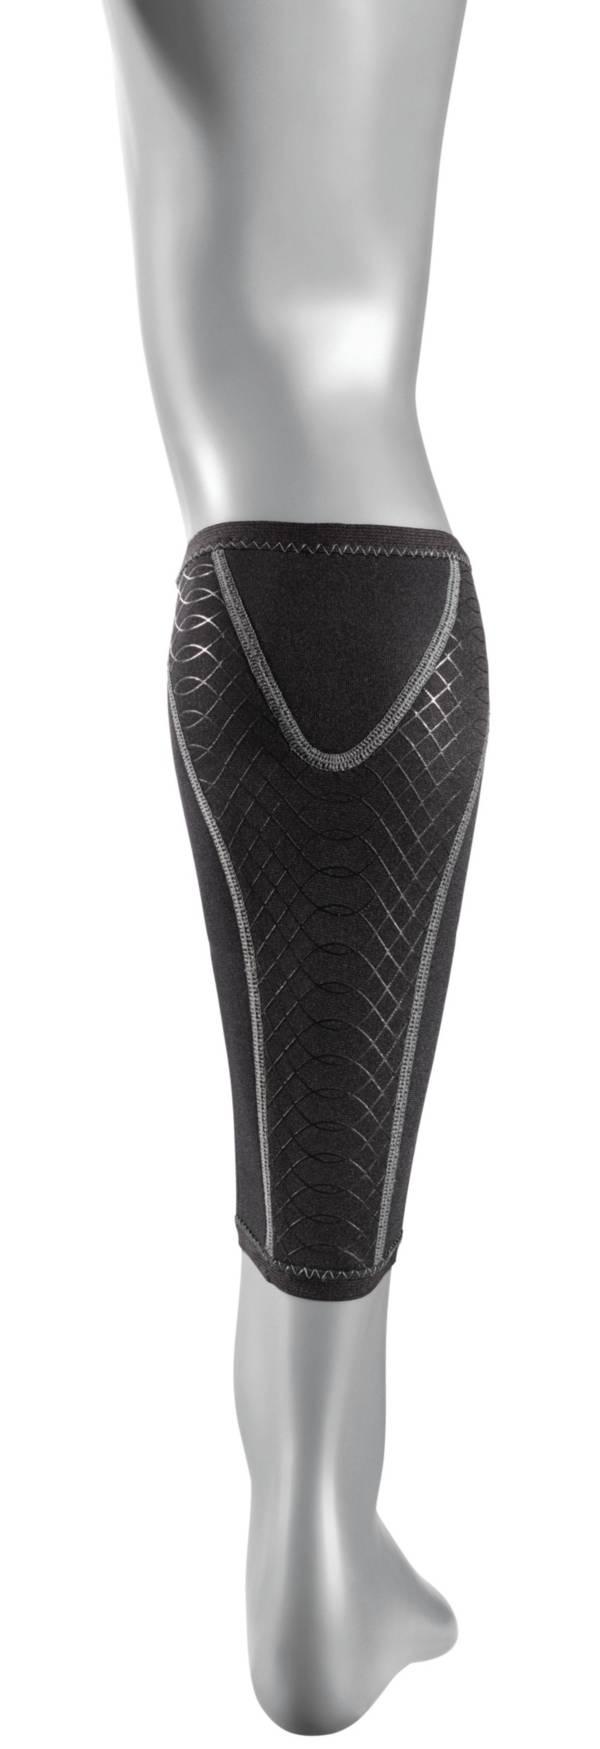 P-TEX Pro Calf Sleeve product image